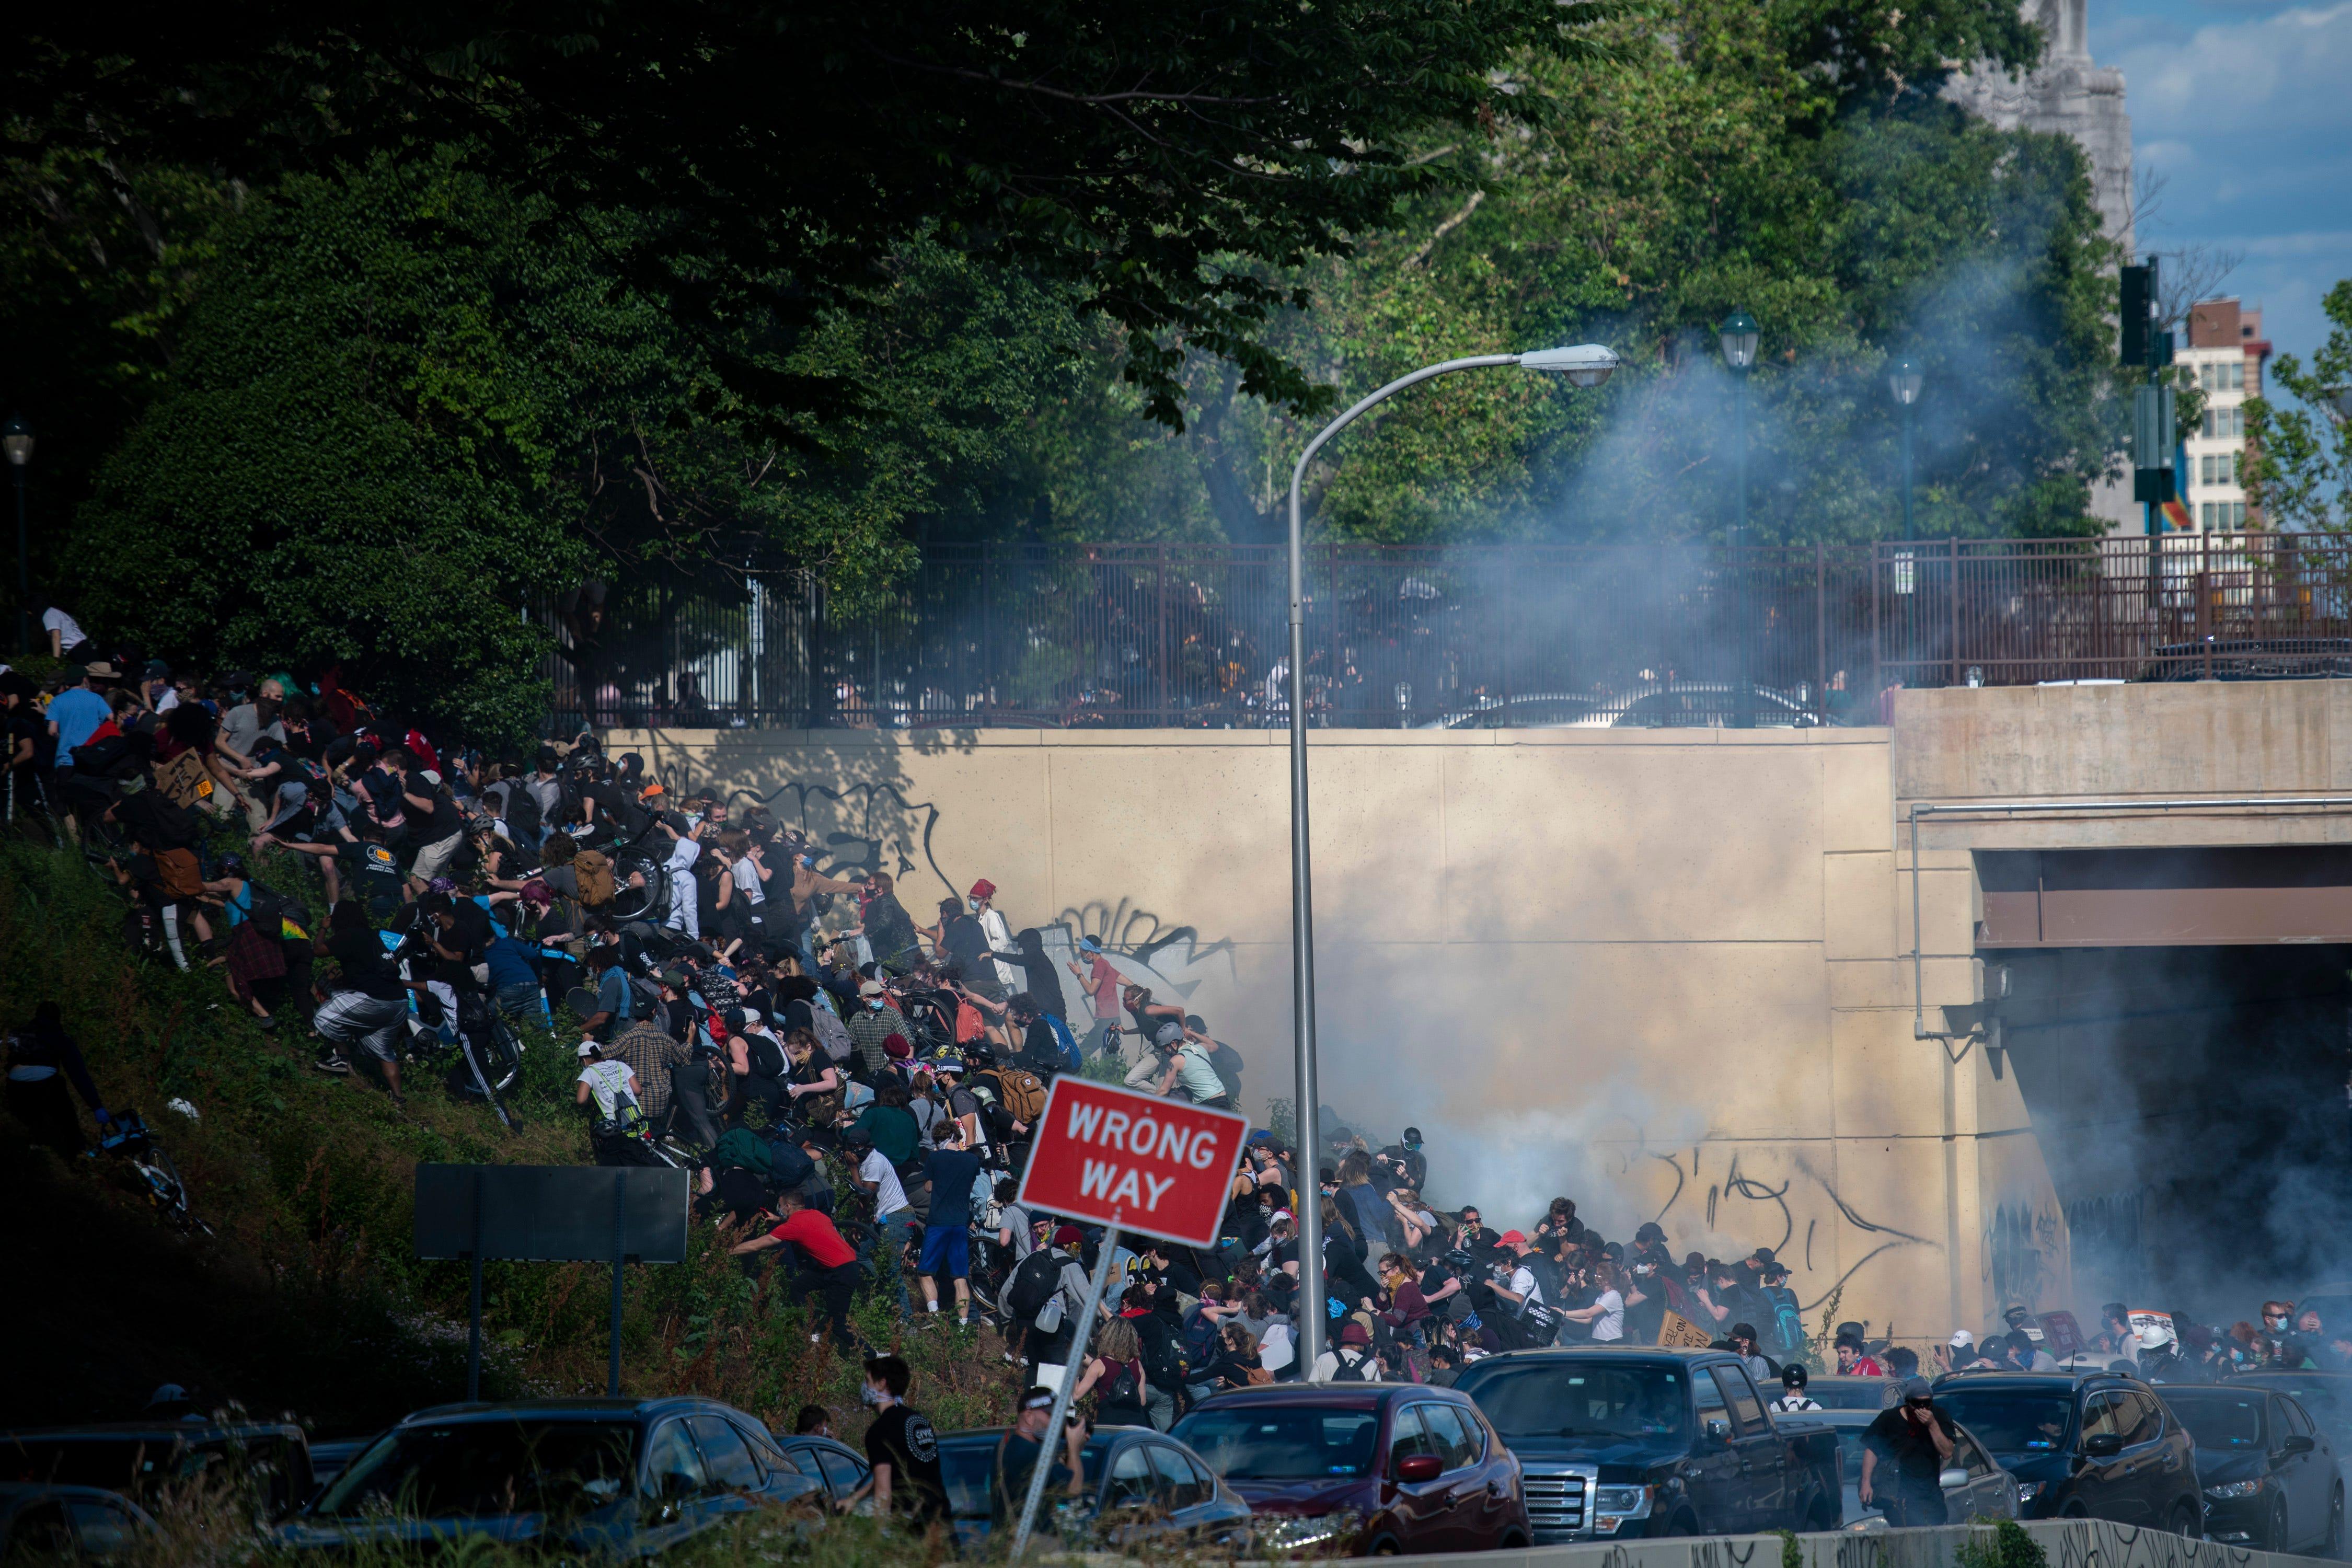 New report says city lacked leadership, planning amid Philadelphia civil unrest